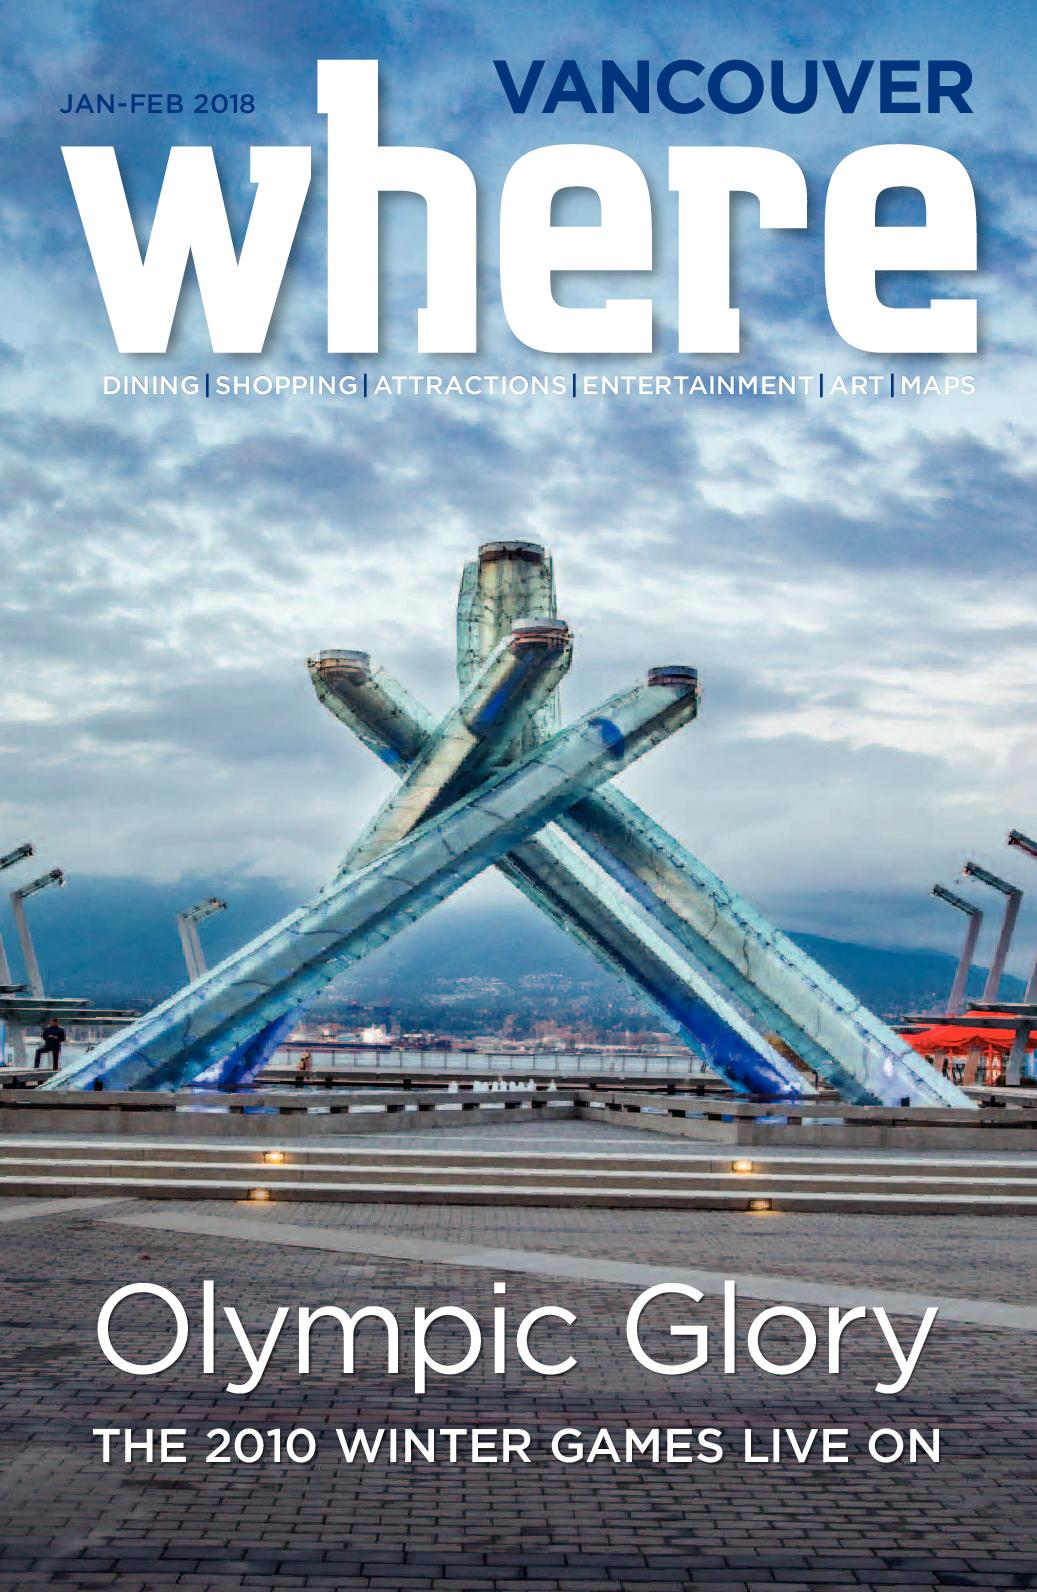 b9e7d1c24c9 Calaméo - Where Vancouver January/February 2018